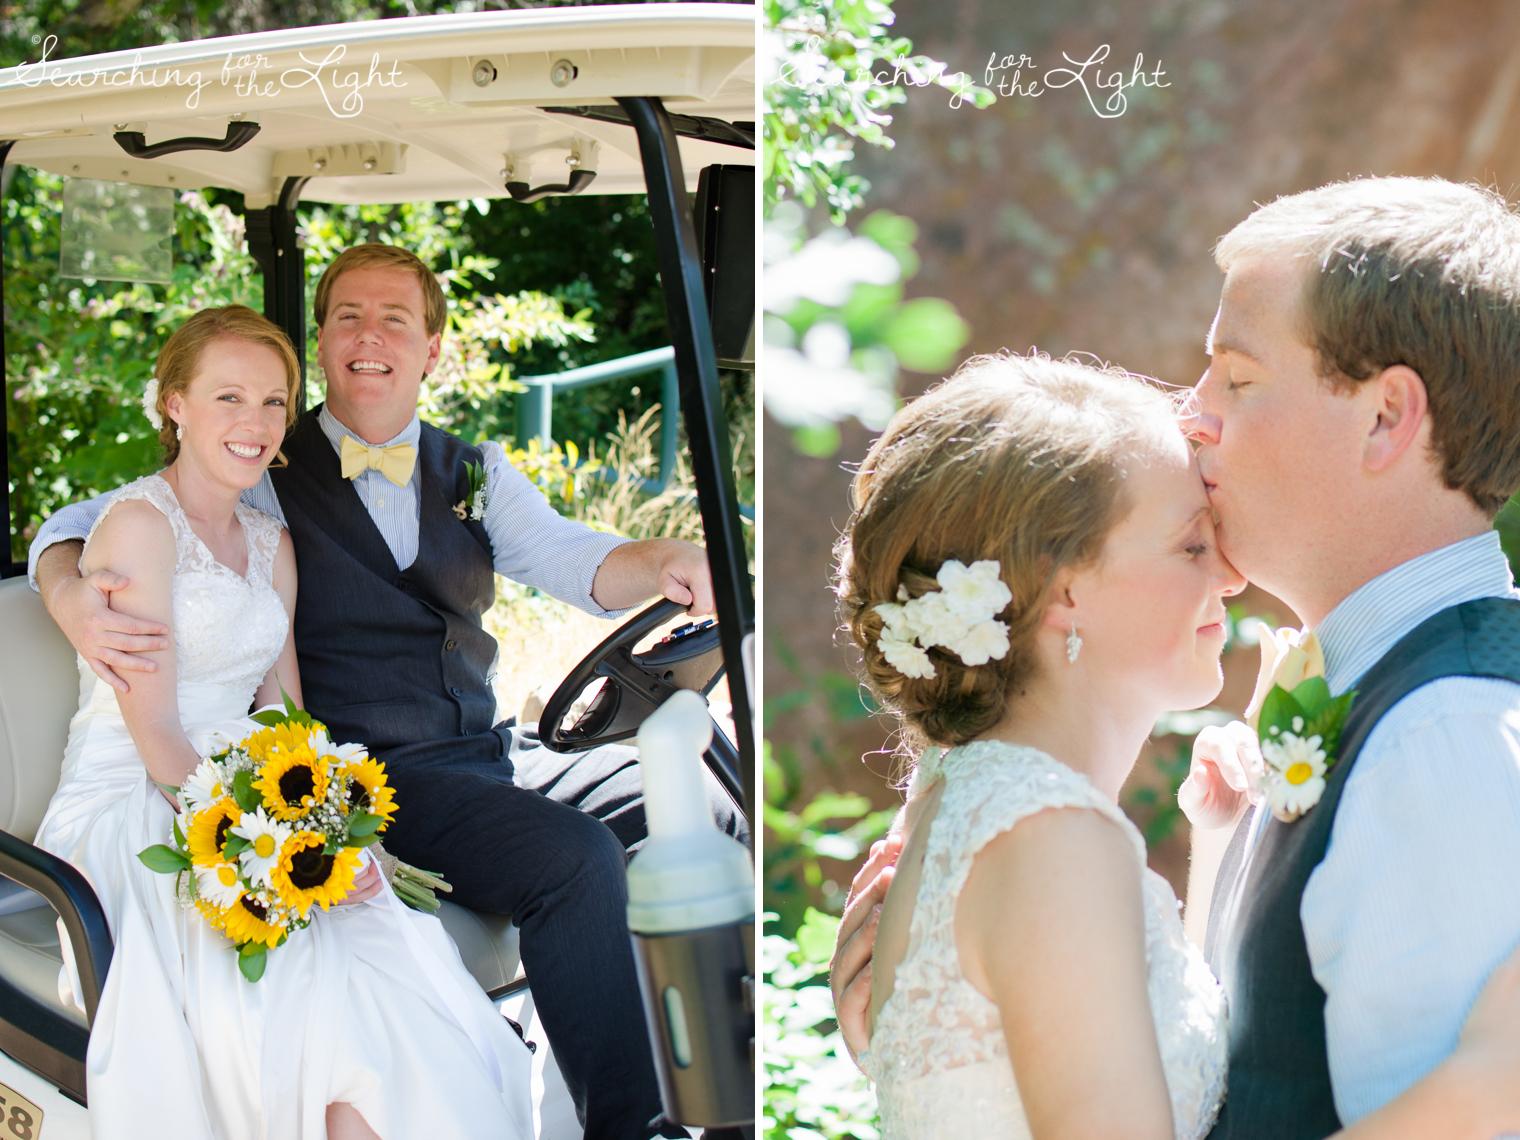 Arrowhead Golf Course Wedding Phots, by Denver Wedding Photographer